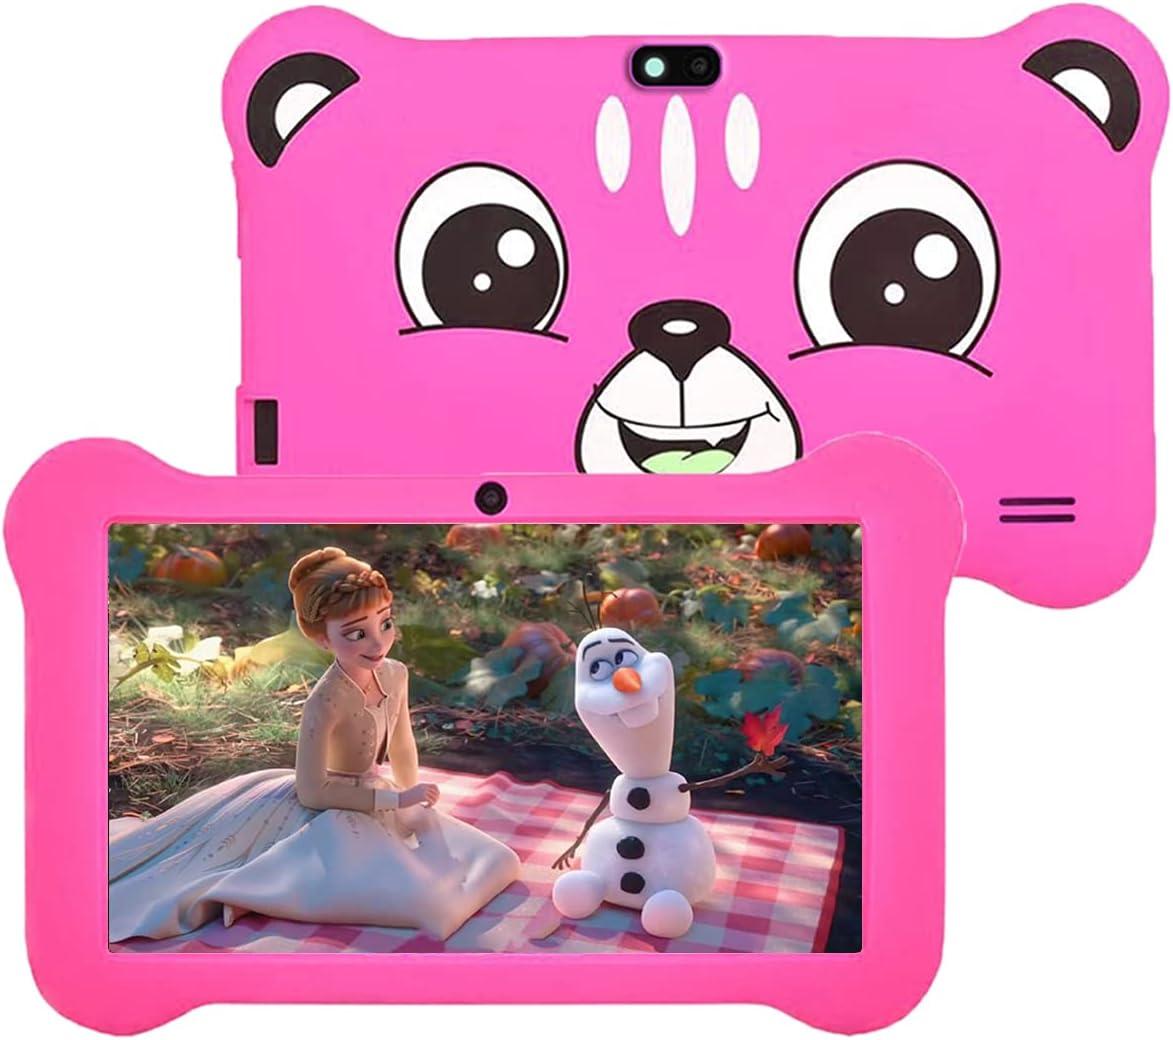 Kids Luxury goods Tablet Android 9.0 OFFer for RAM ROM Ki 16GB 2GB